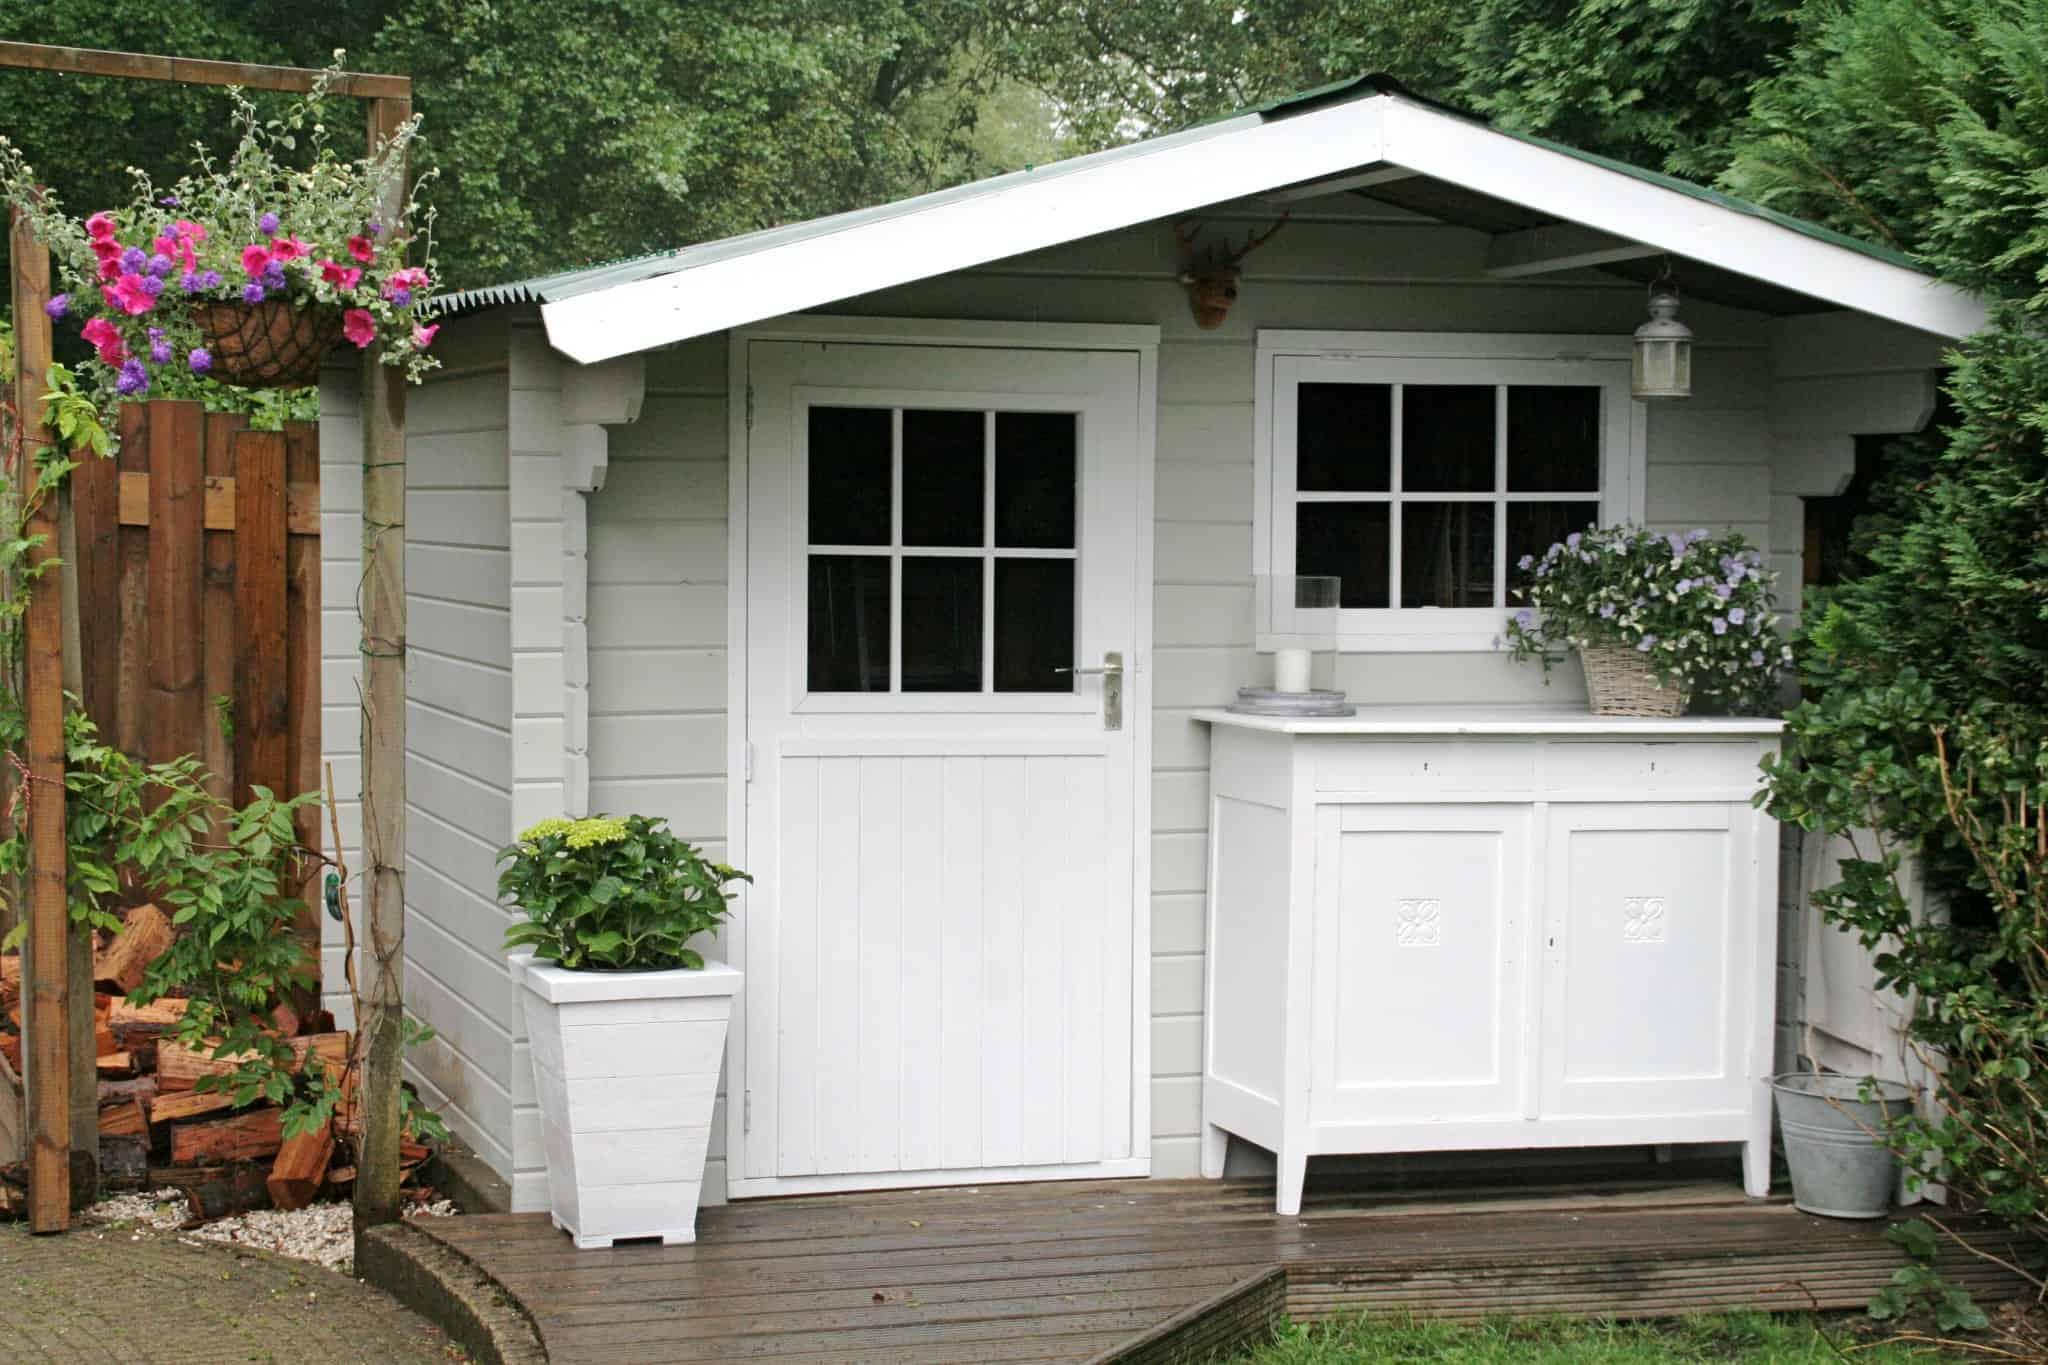 tuinhuis verven tuinhuisje verven met moose f rg simpel. Black Bedroom Furniture Sets. Home Design Ideas